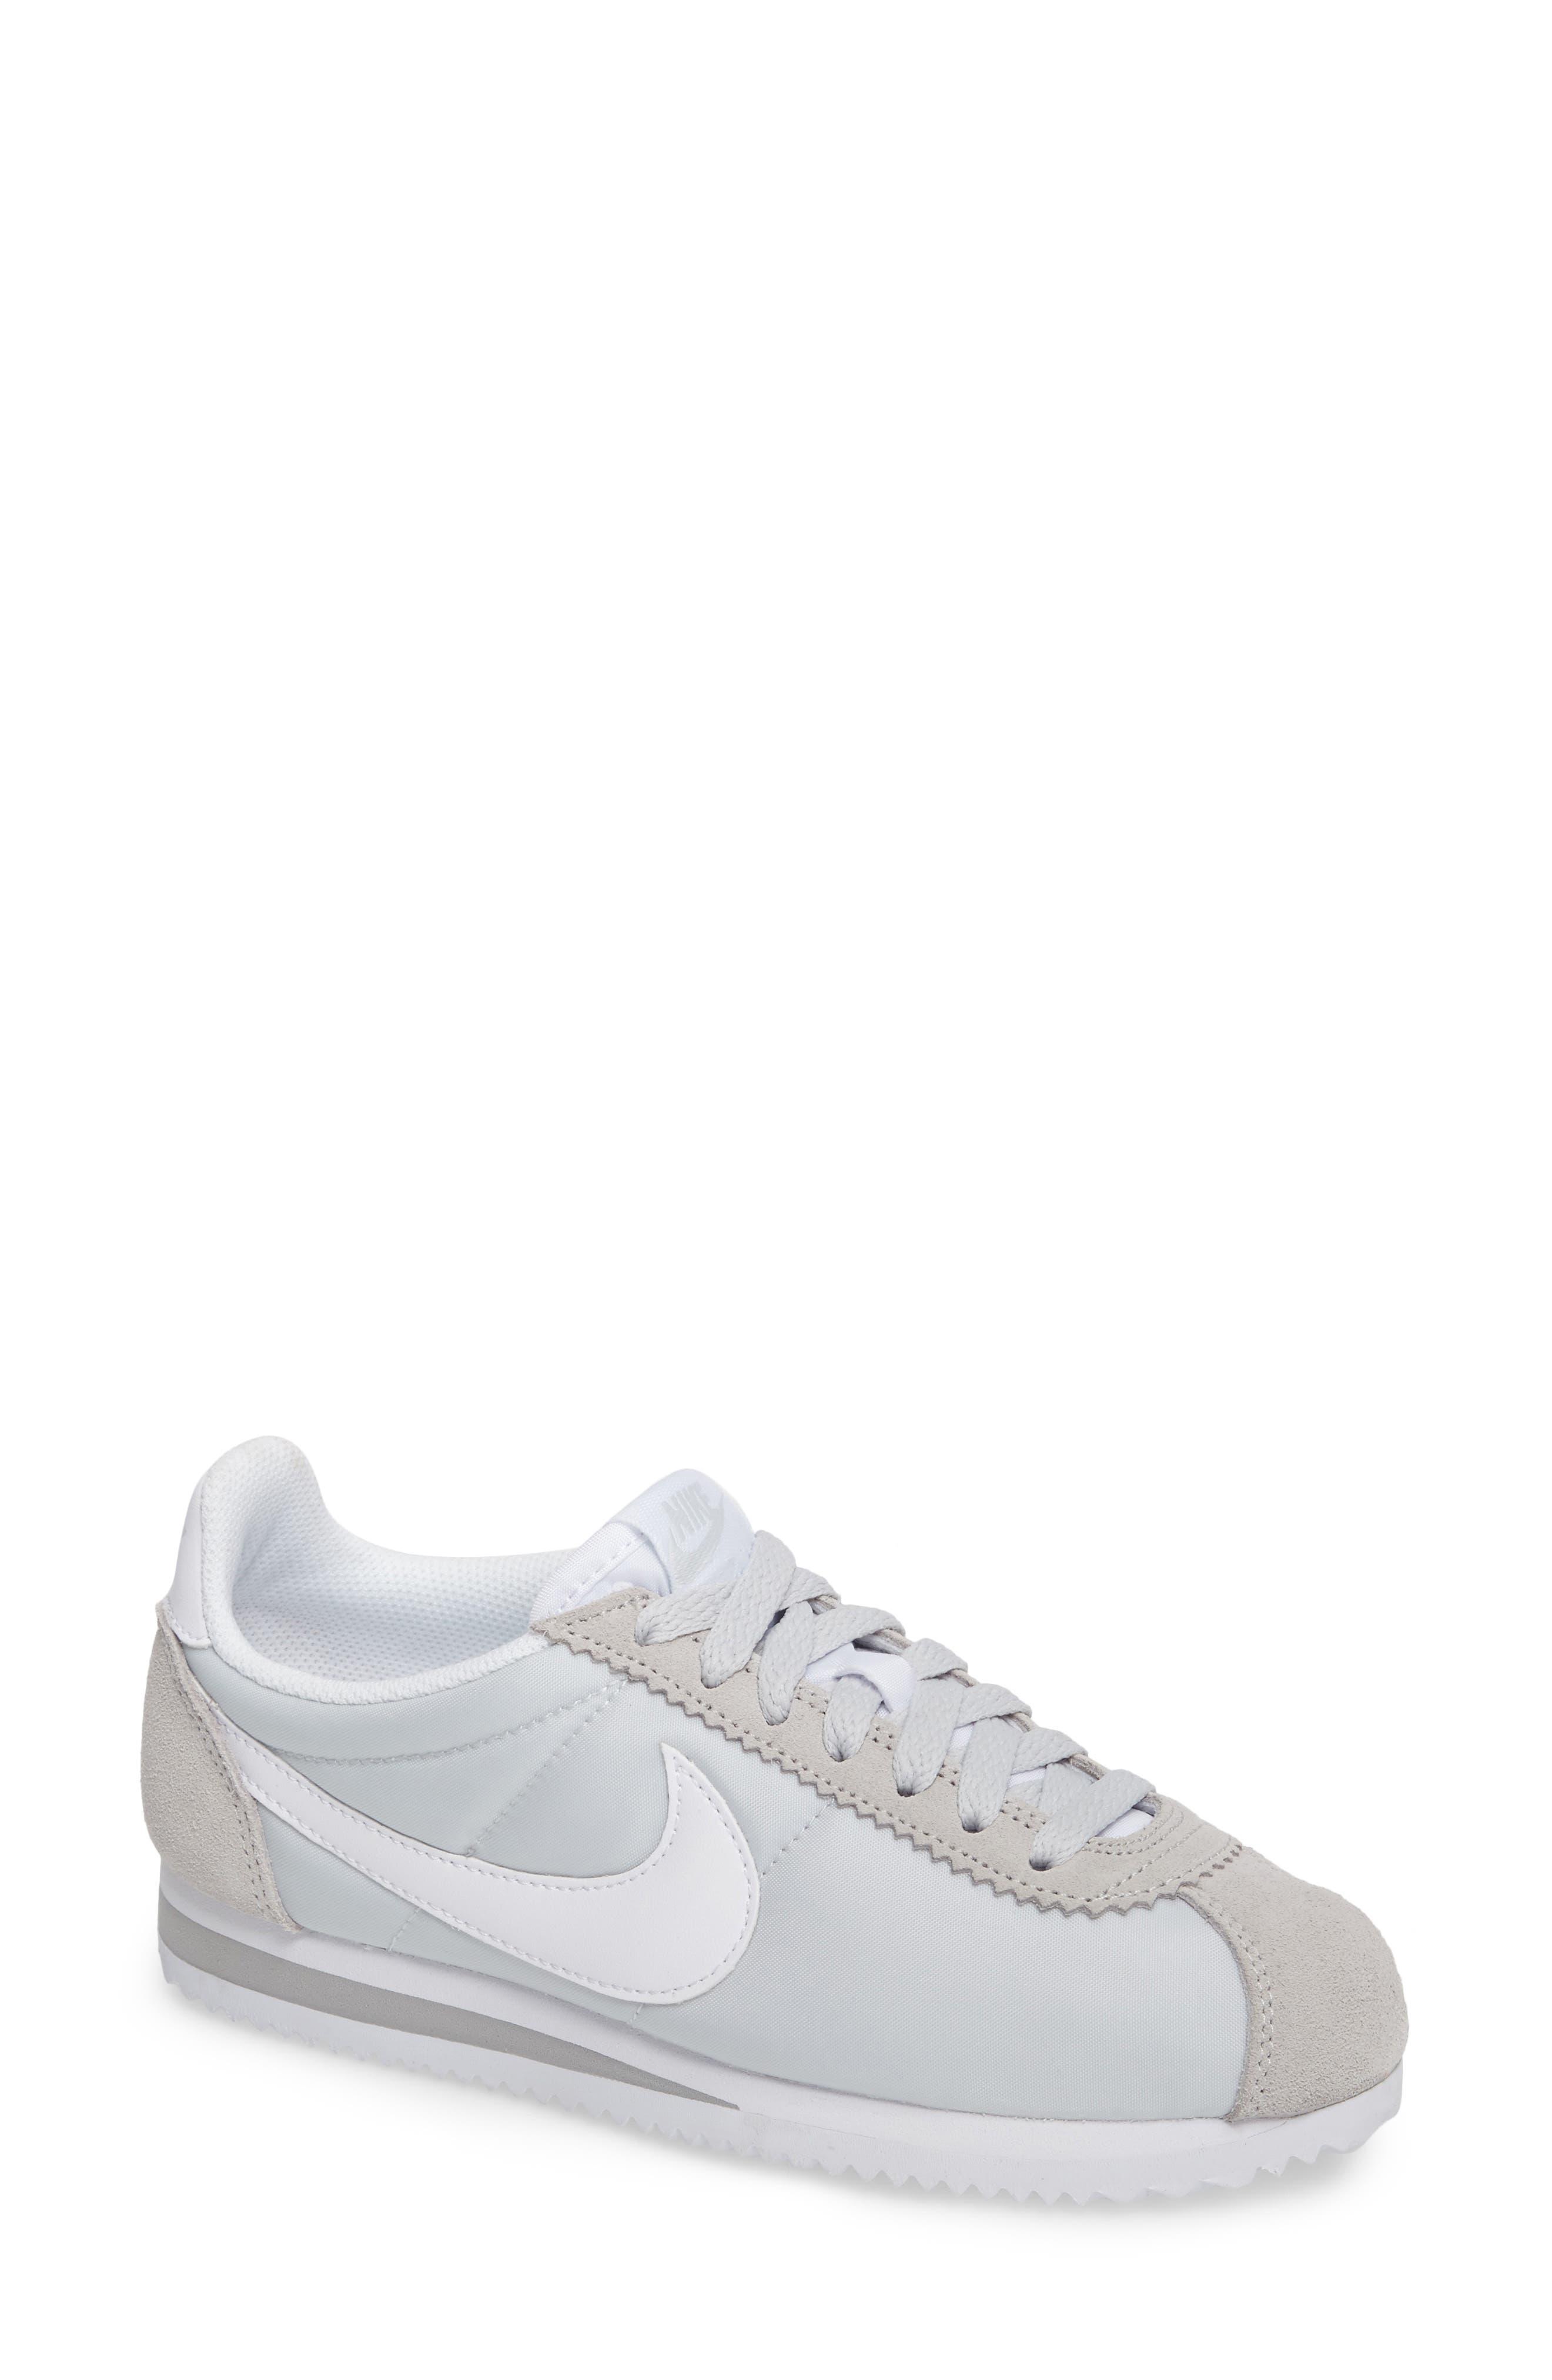 940be62b31317 ... coupon for nike classic cortez sneaker women c30c8 b2afc